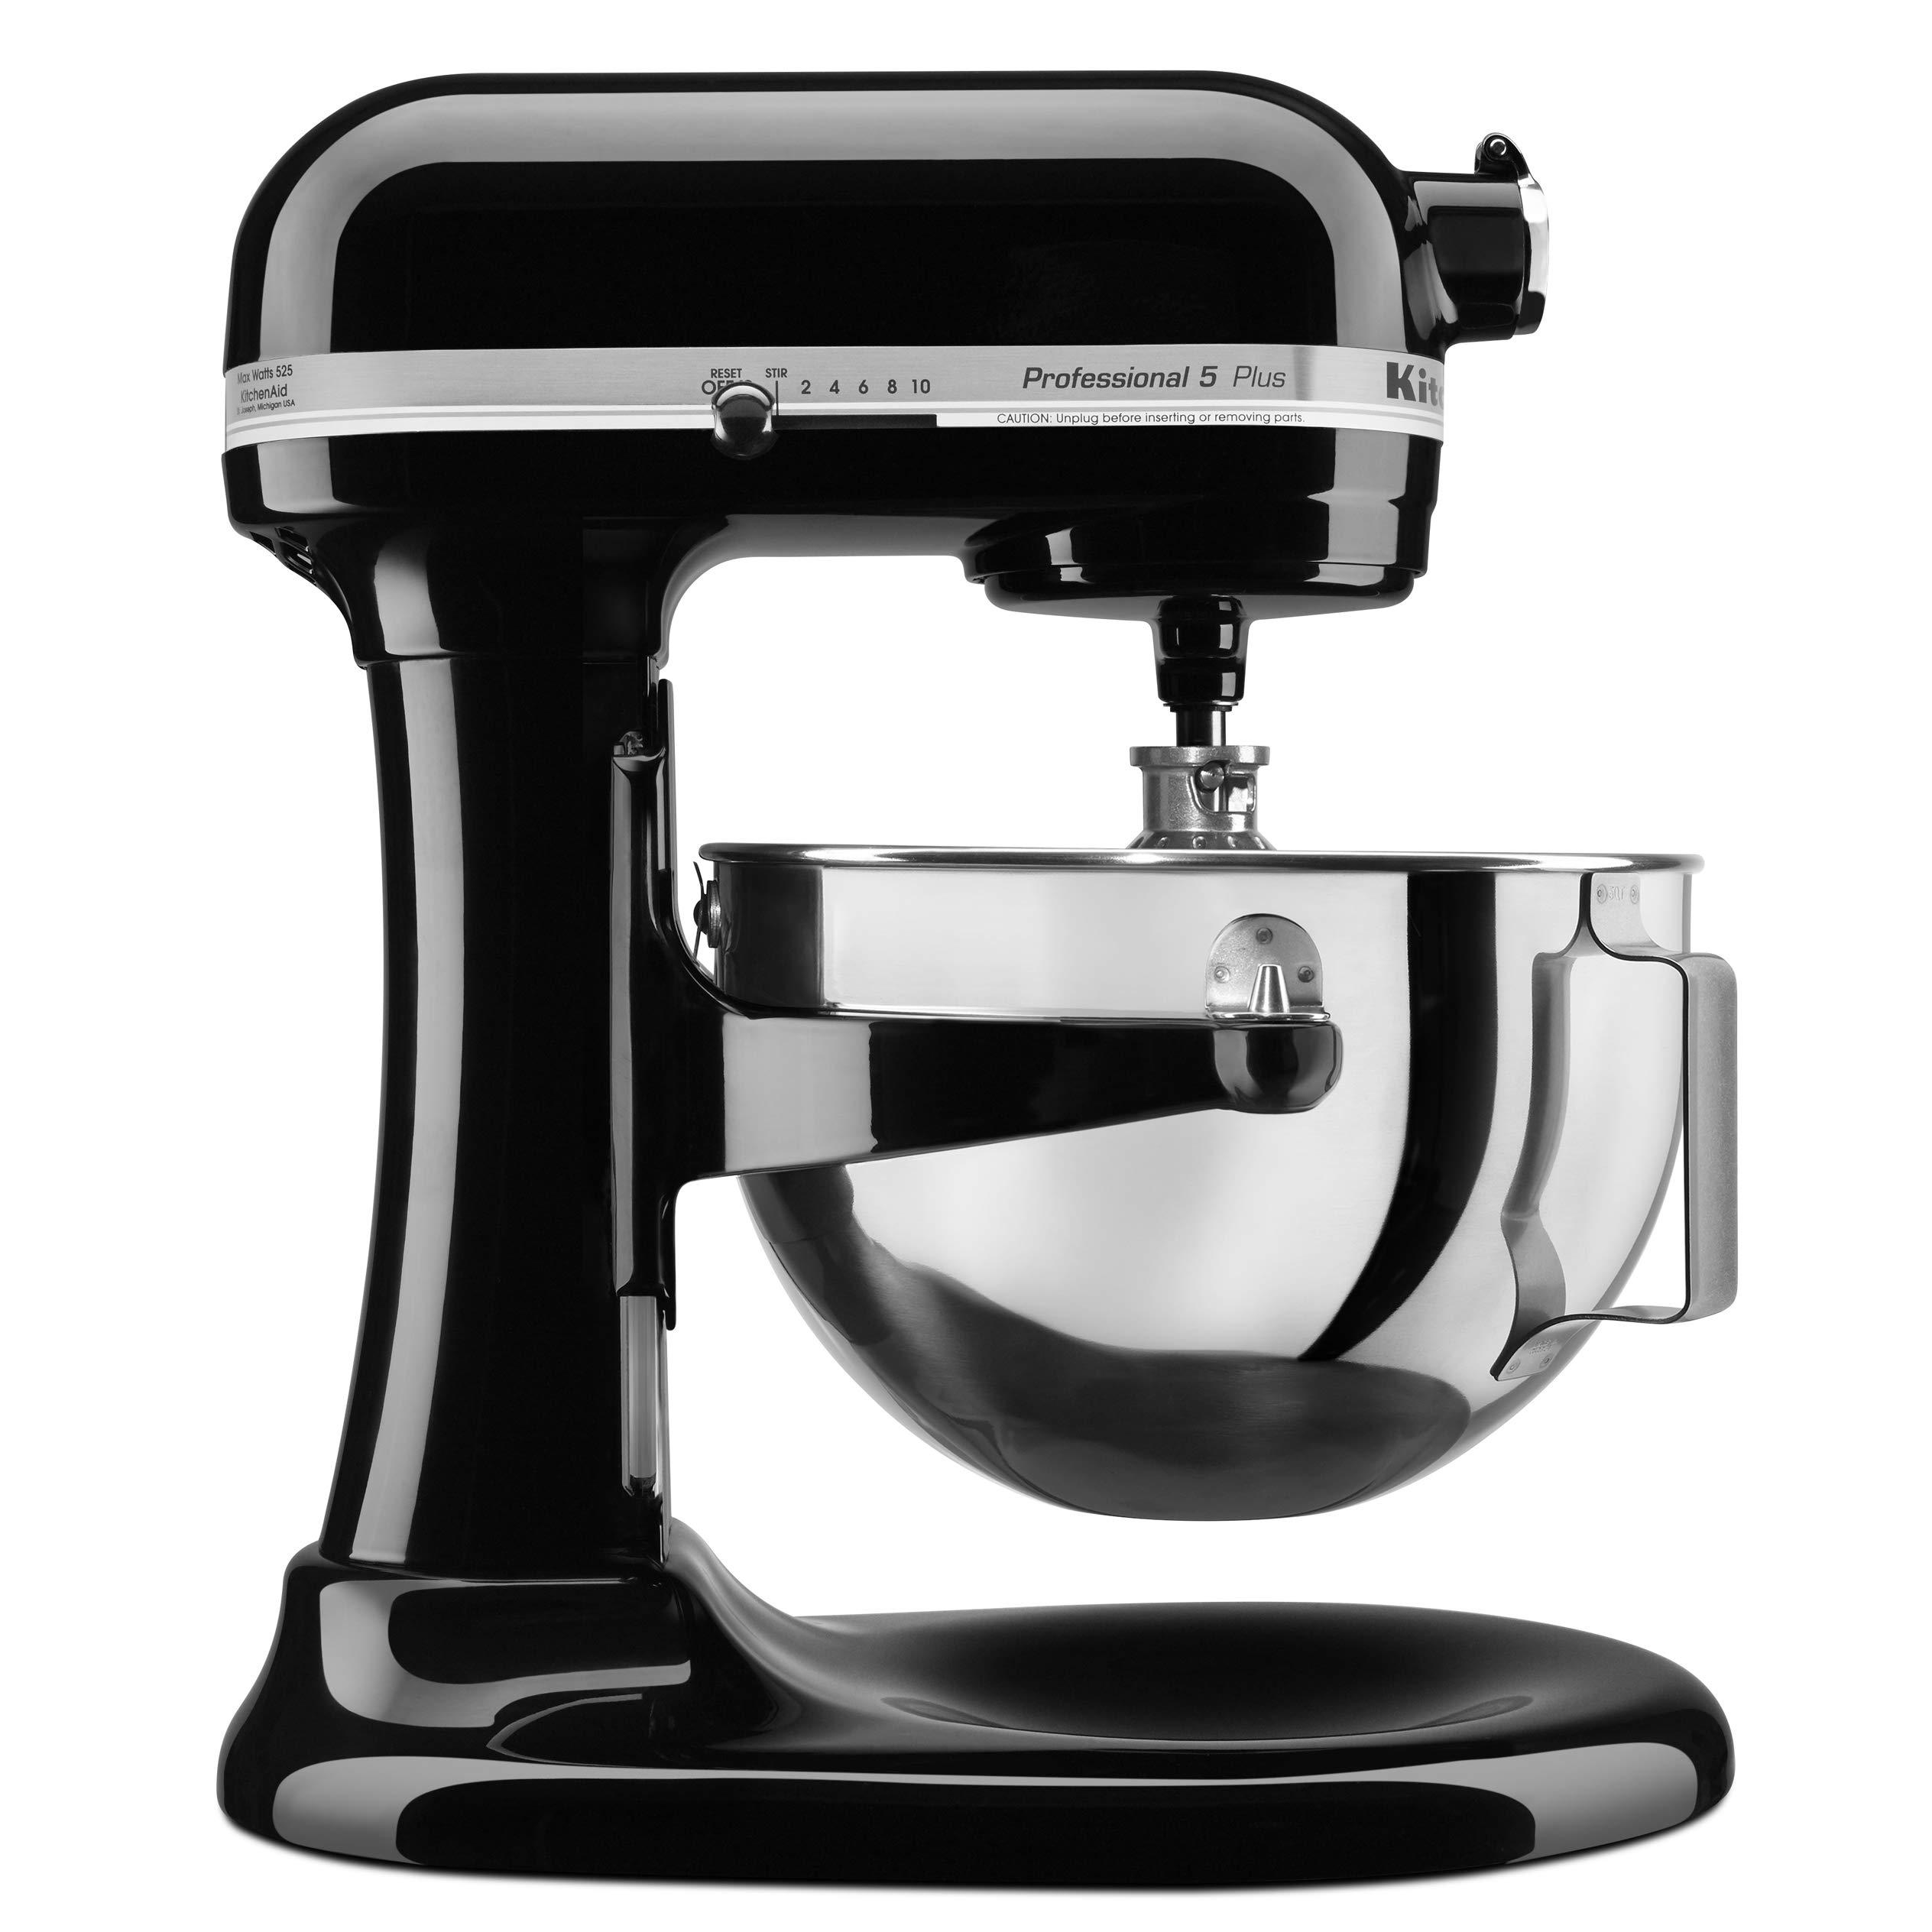 KitchenAid Professional Plus Stand Mixers